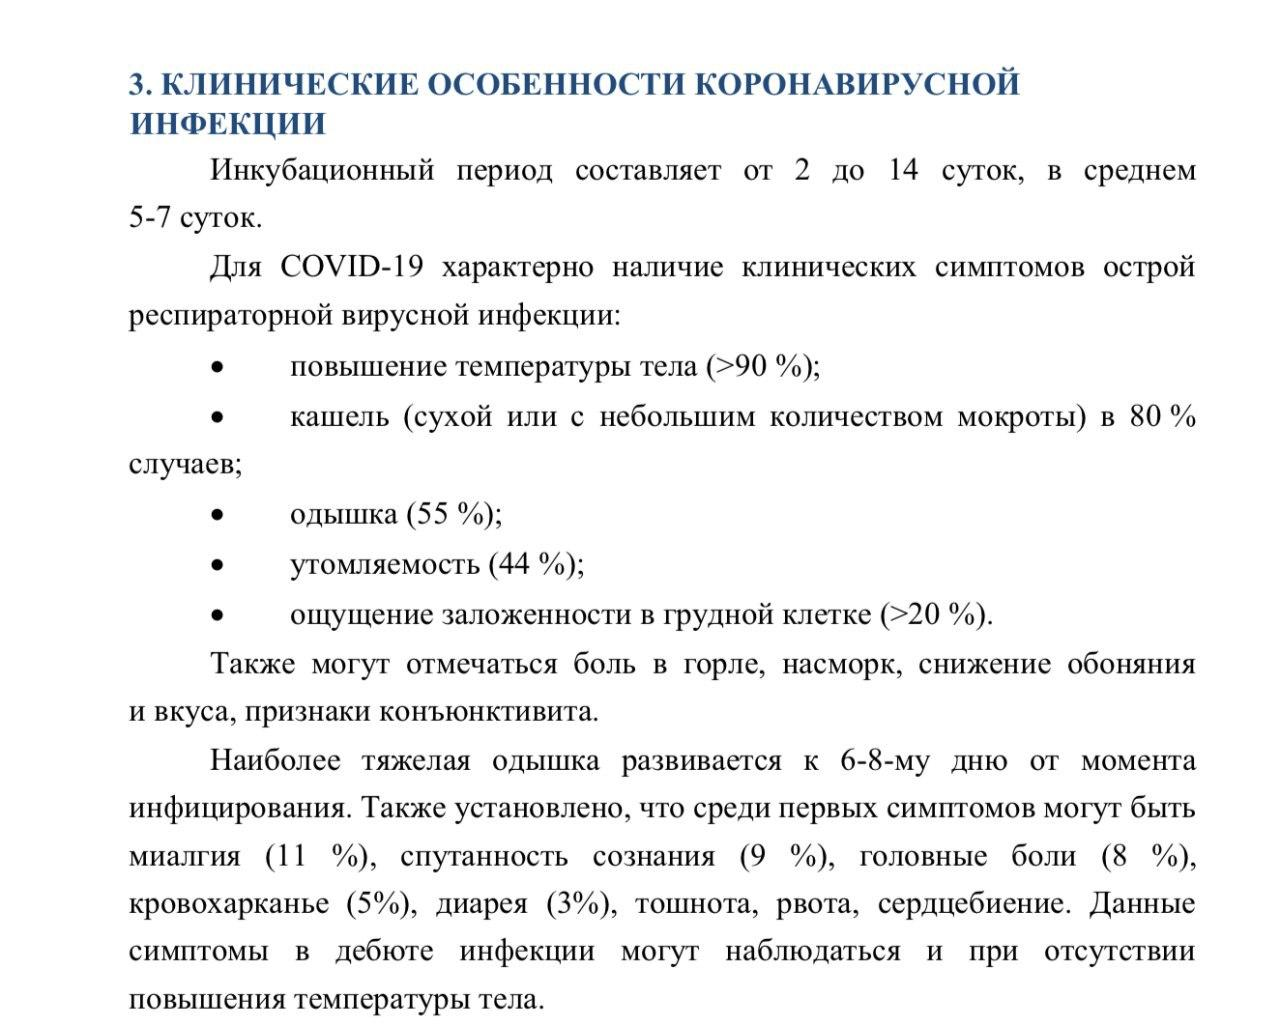 https://glav.su/files/messages/2020/04/09/5624419_294eef16e326a3e1a475bd2025b9cb59.jpg